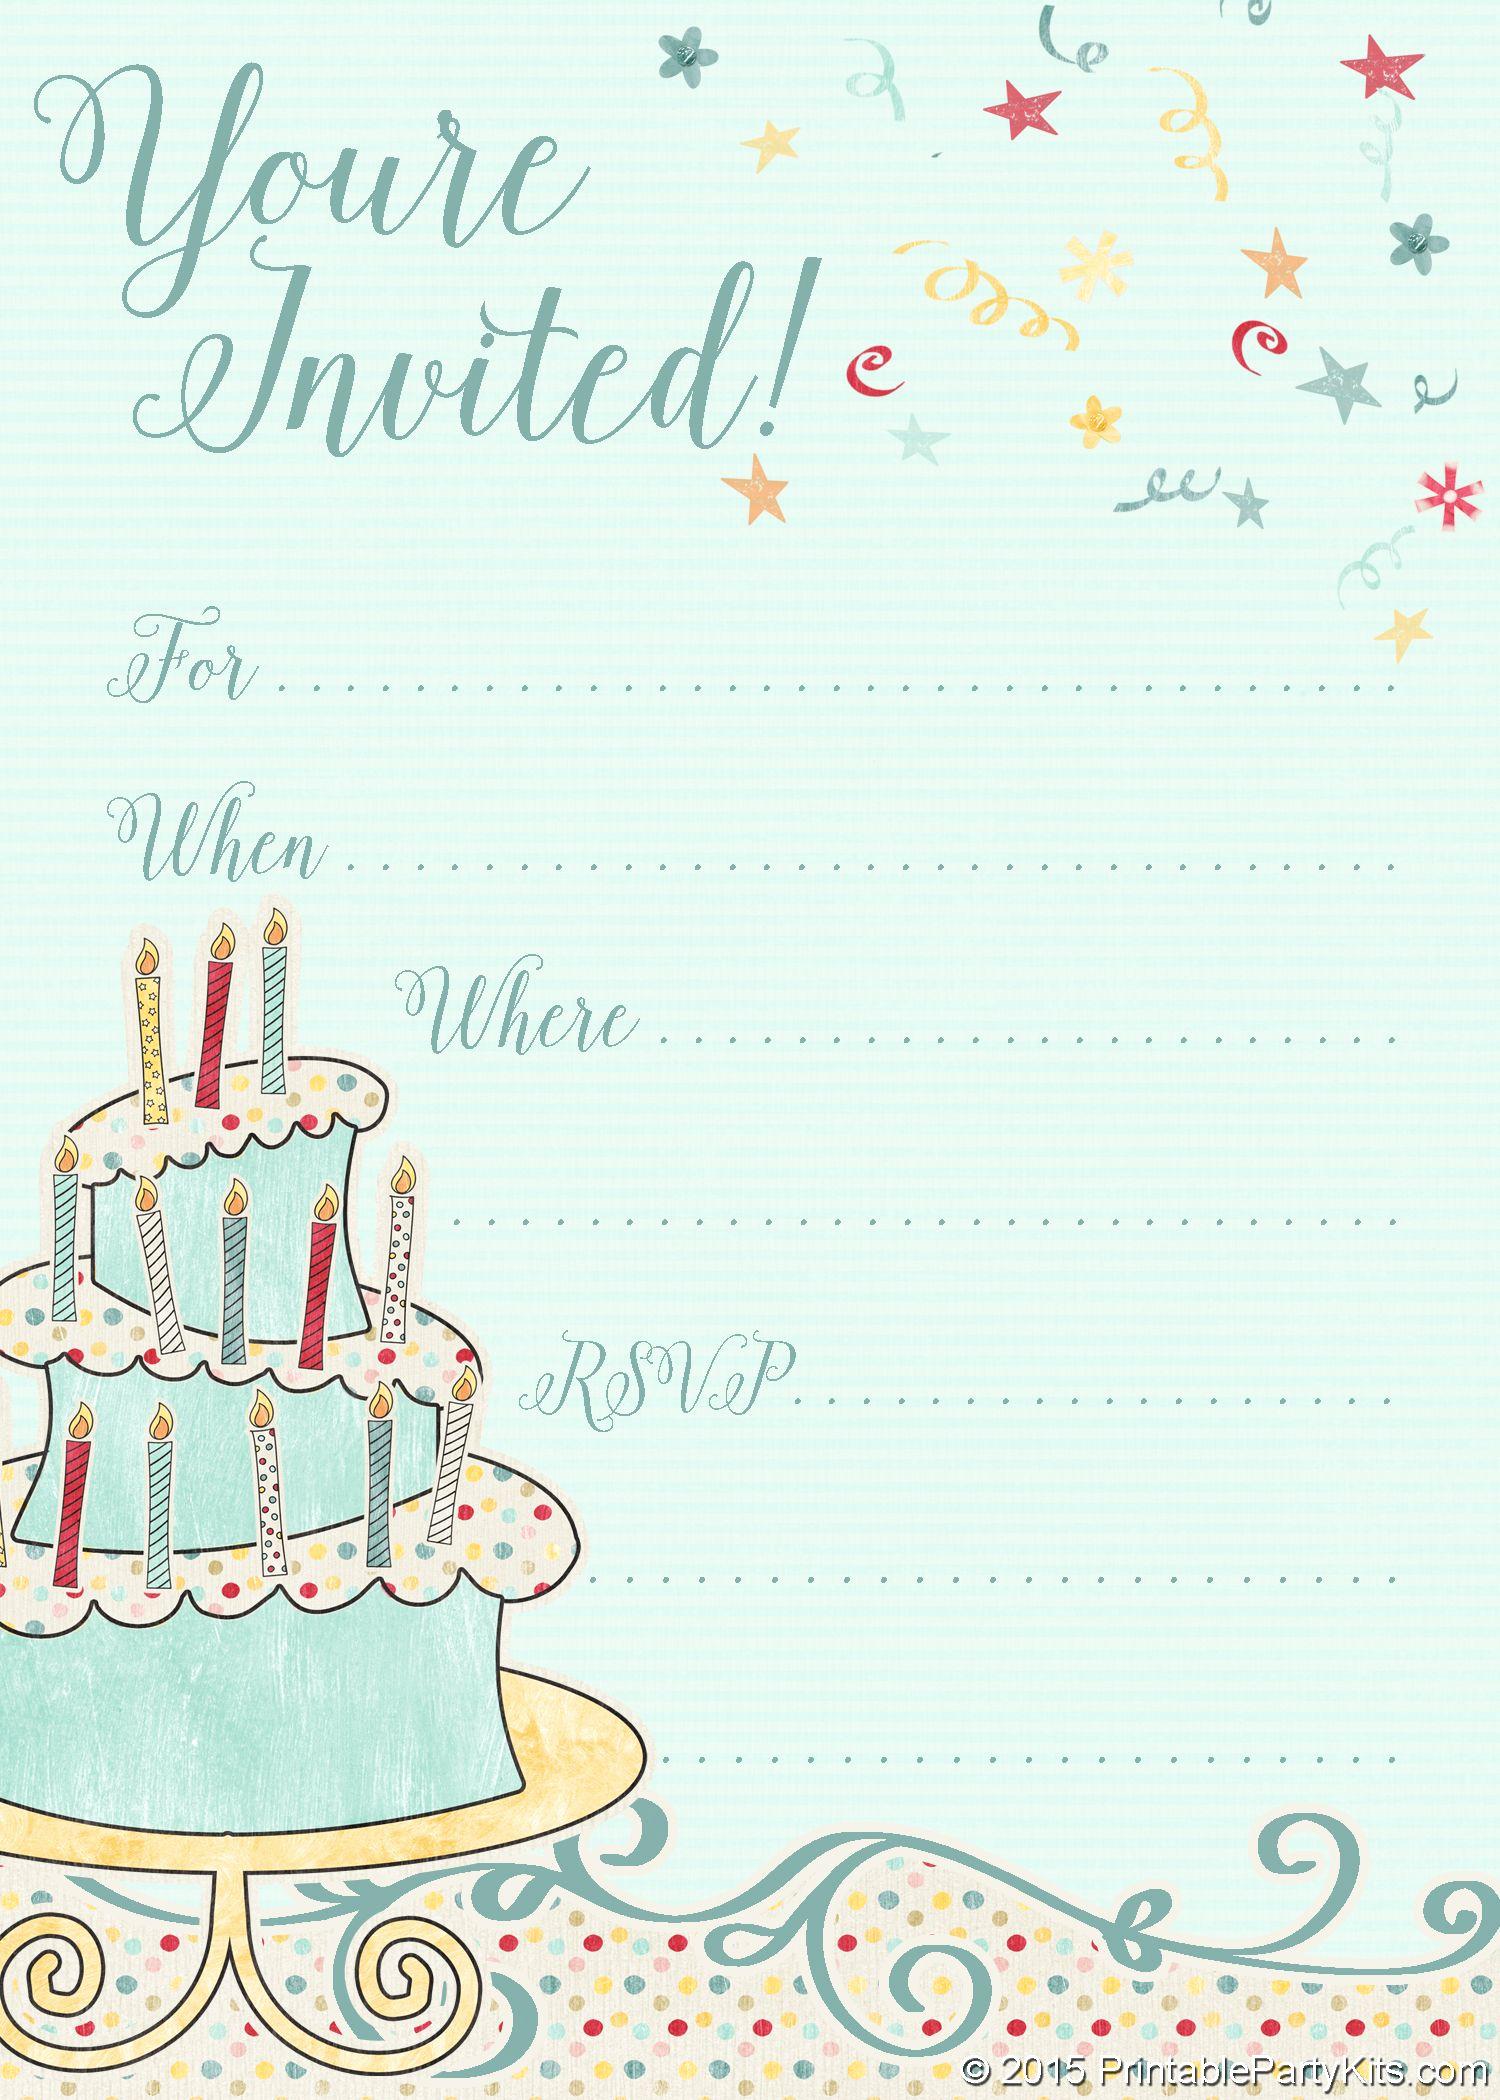 Birthday Party Invitation Template Beautiful Free Printable Whimsical Birthday Party Invitation